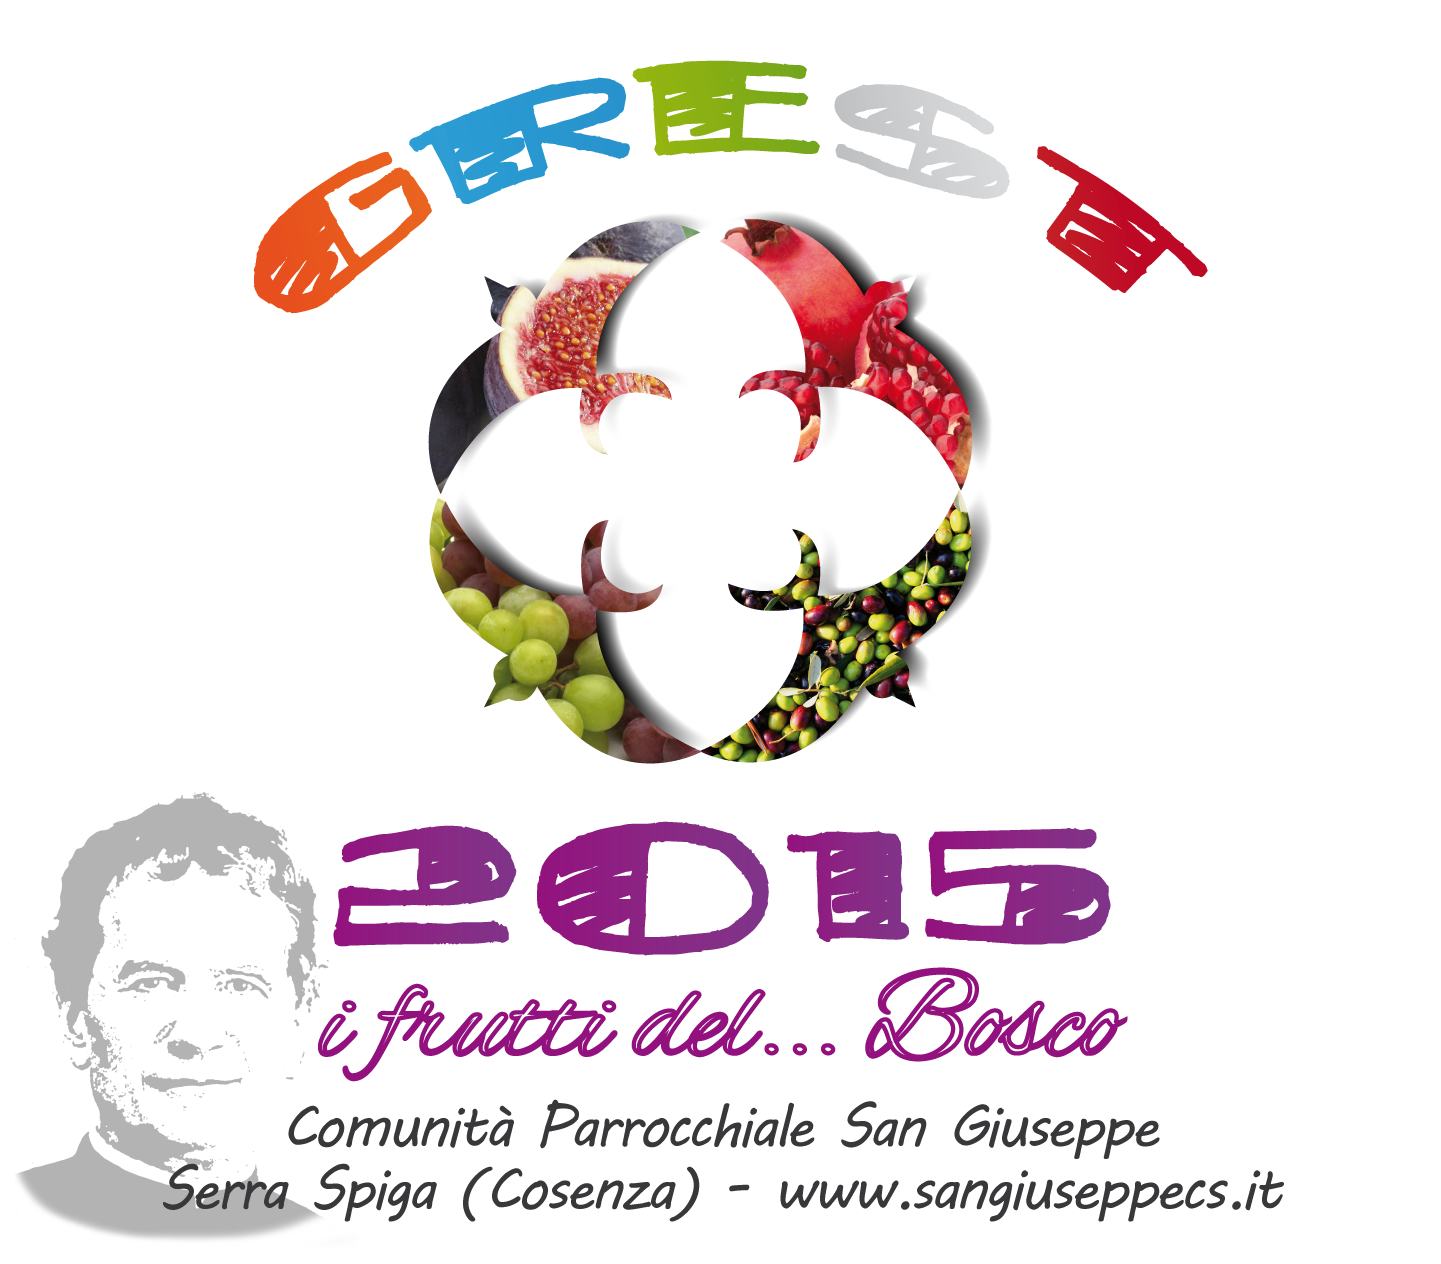 Grest 2015 - Parrocchia S. Giuseppe Don bosco-01 (1)